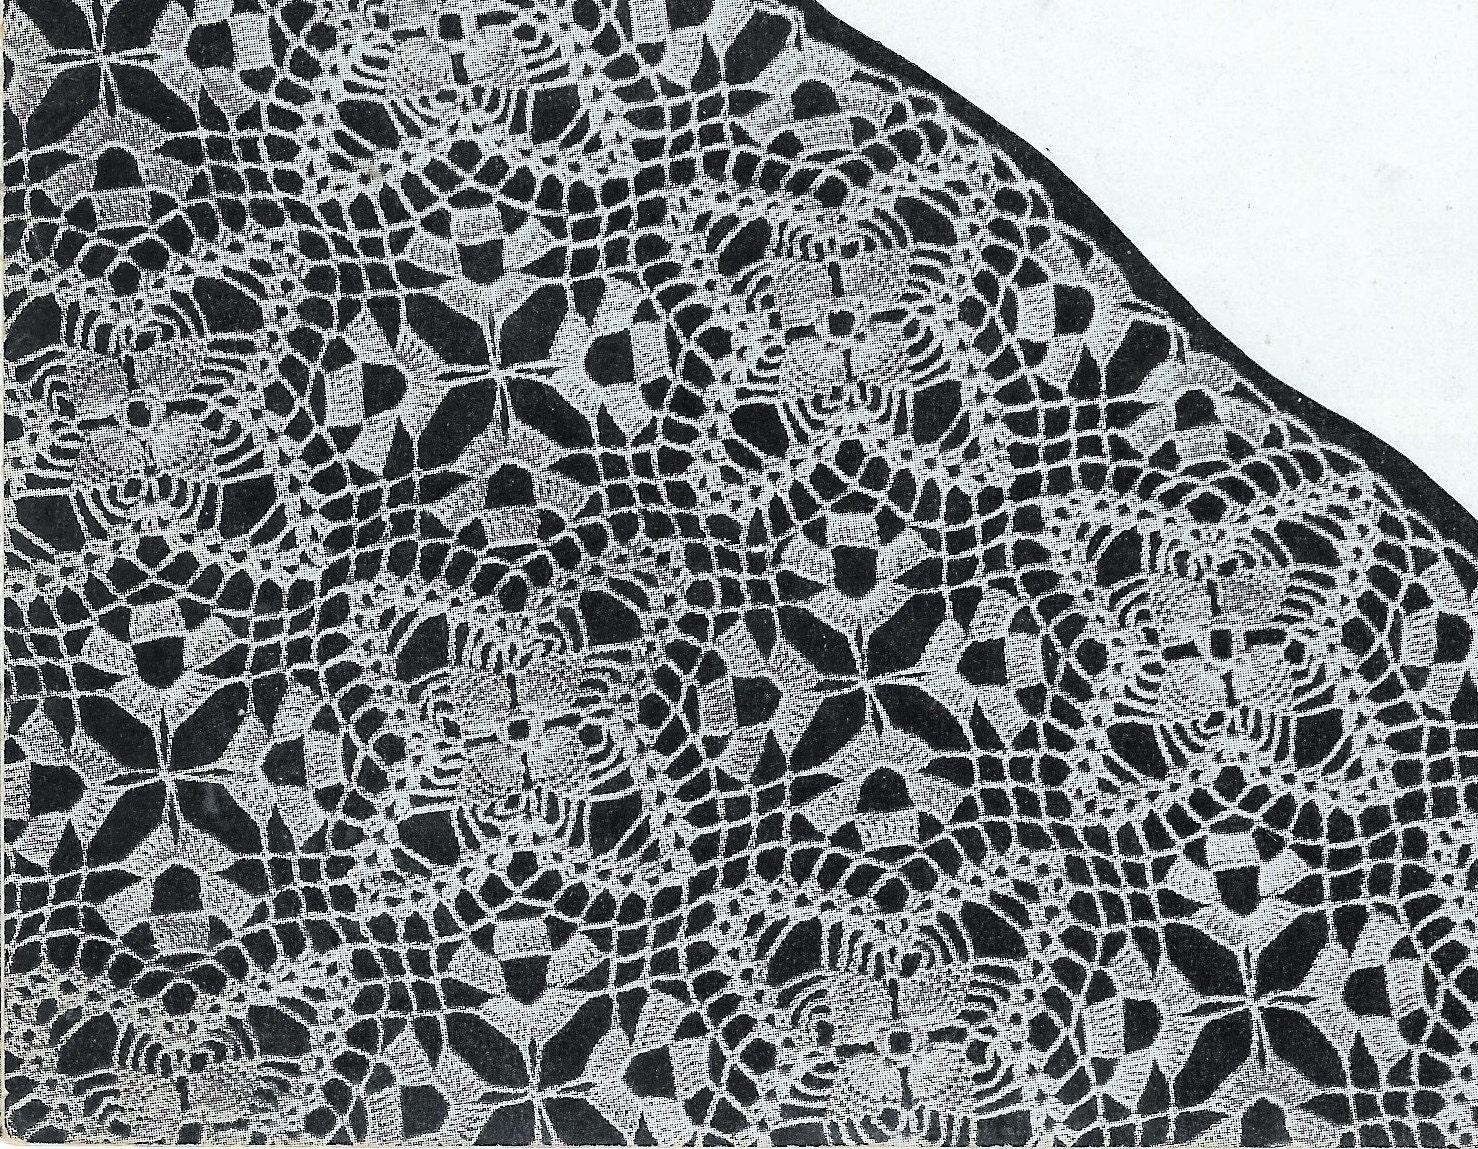 Crochet tablecloth pattern square motif lace crochet zoom bankloansurffo Gallery